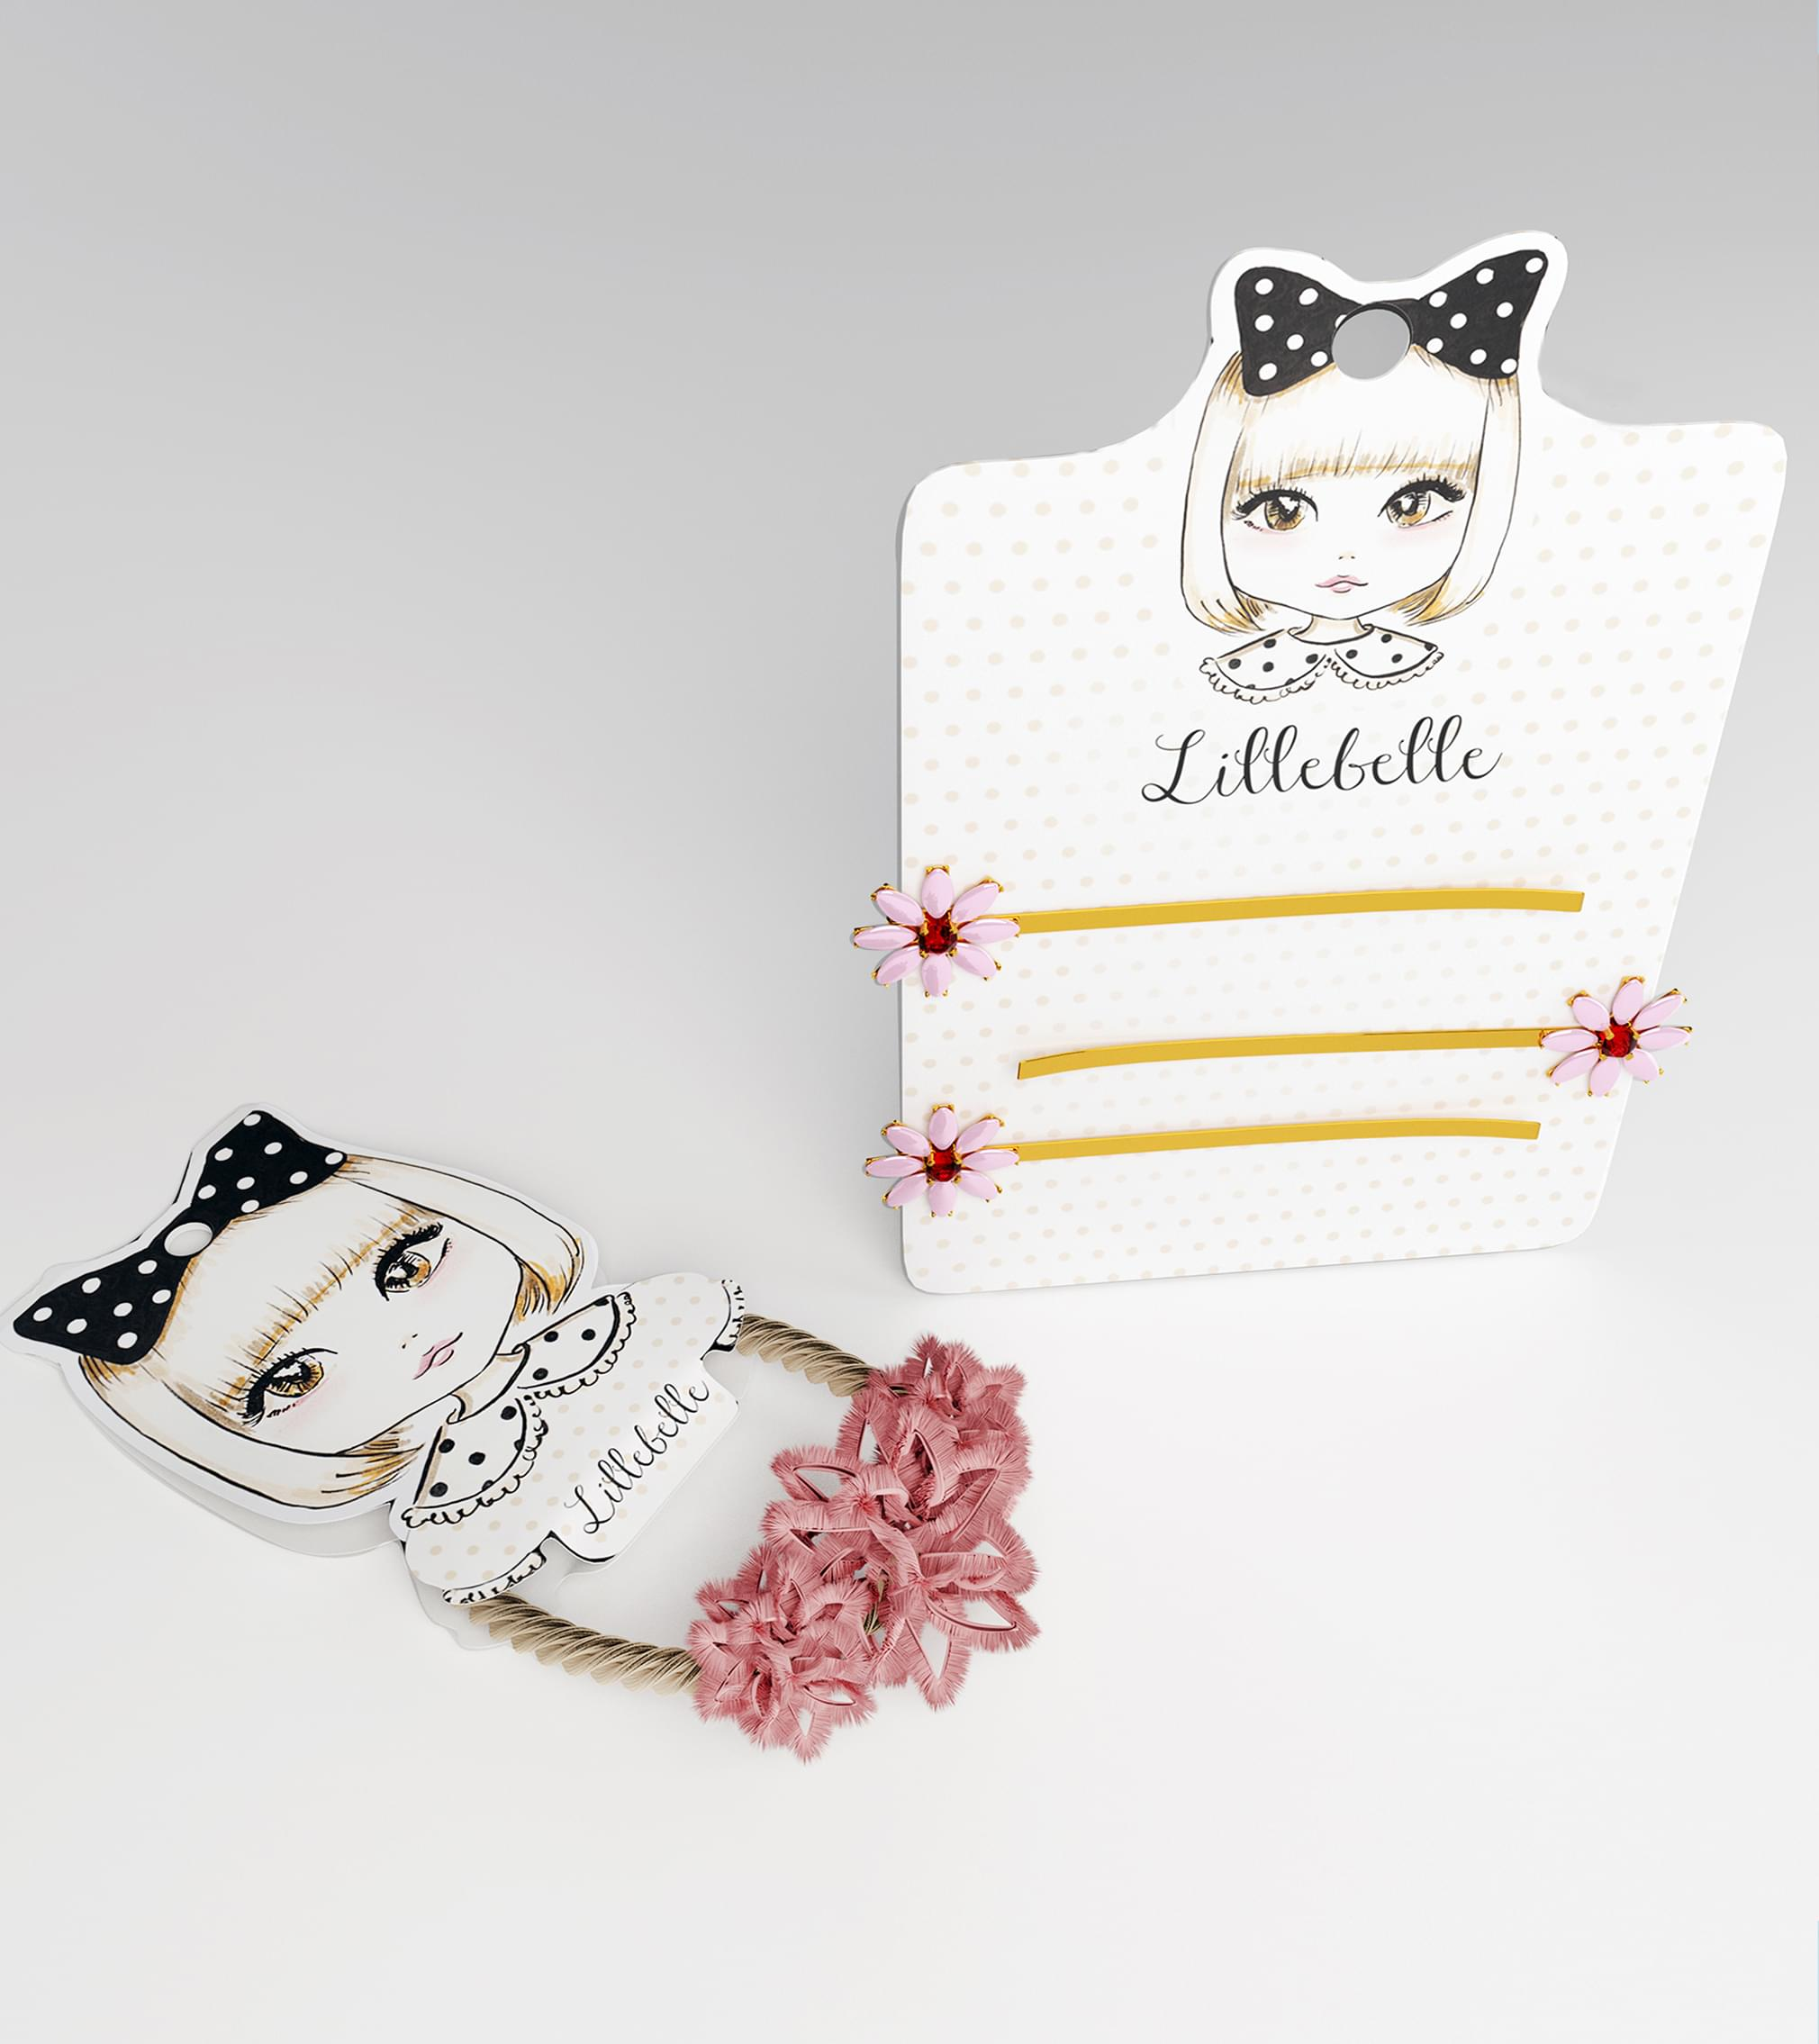 LILLEBELLE Packaging